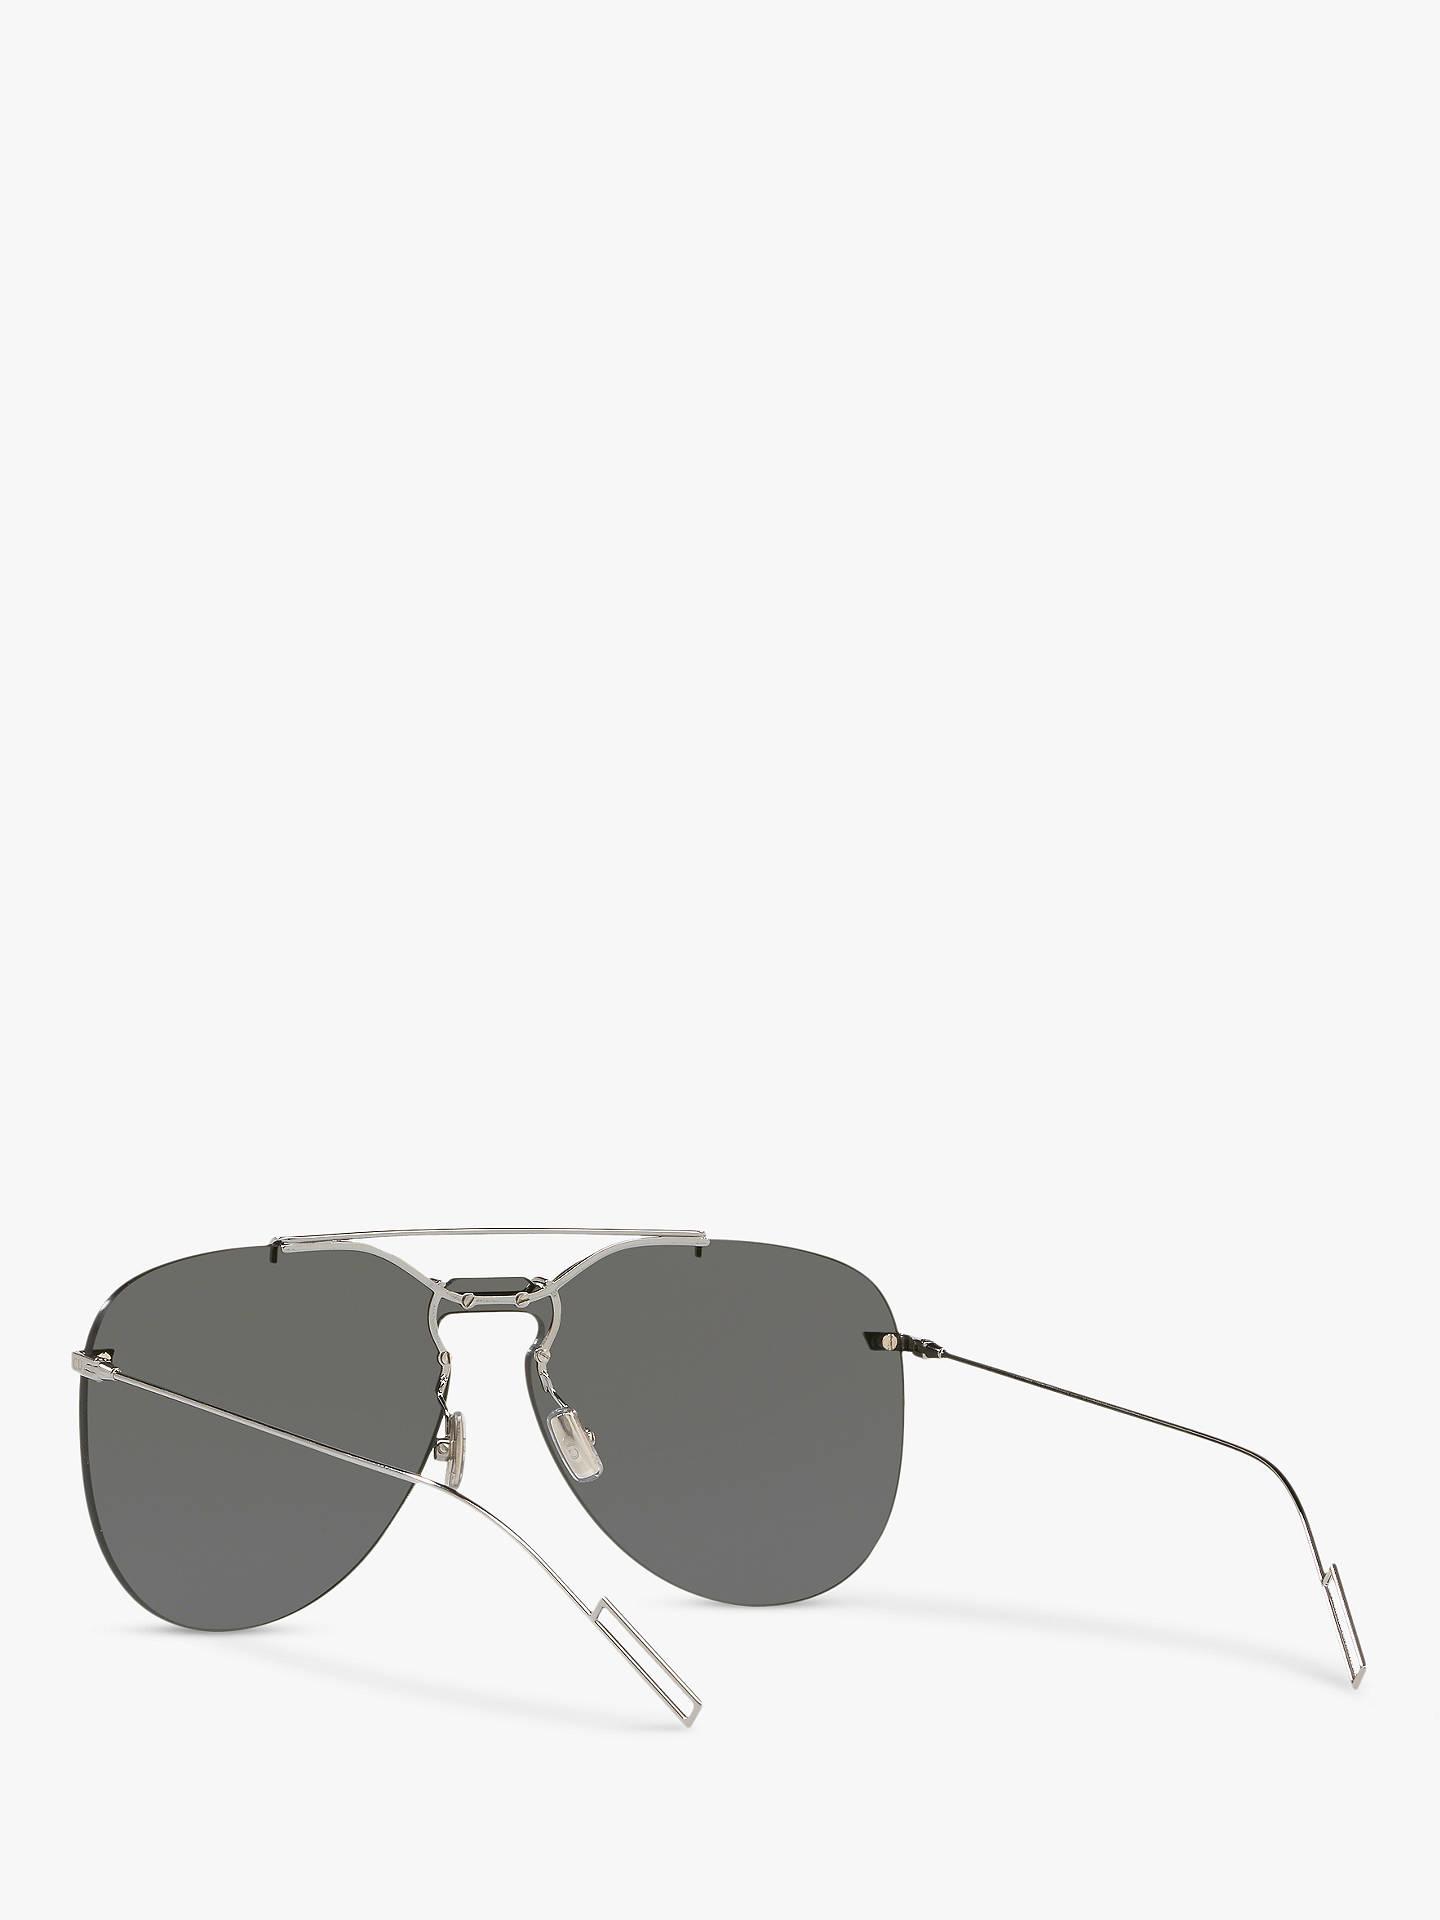 8a4f6e74b31b ... Buy Dior Dior0222S Men's Aviator Sunglasses, Silver/Grey Online at  johnlewis. ...